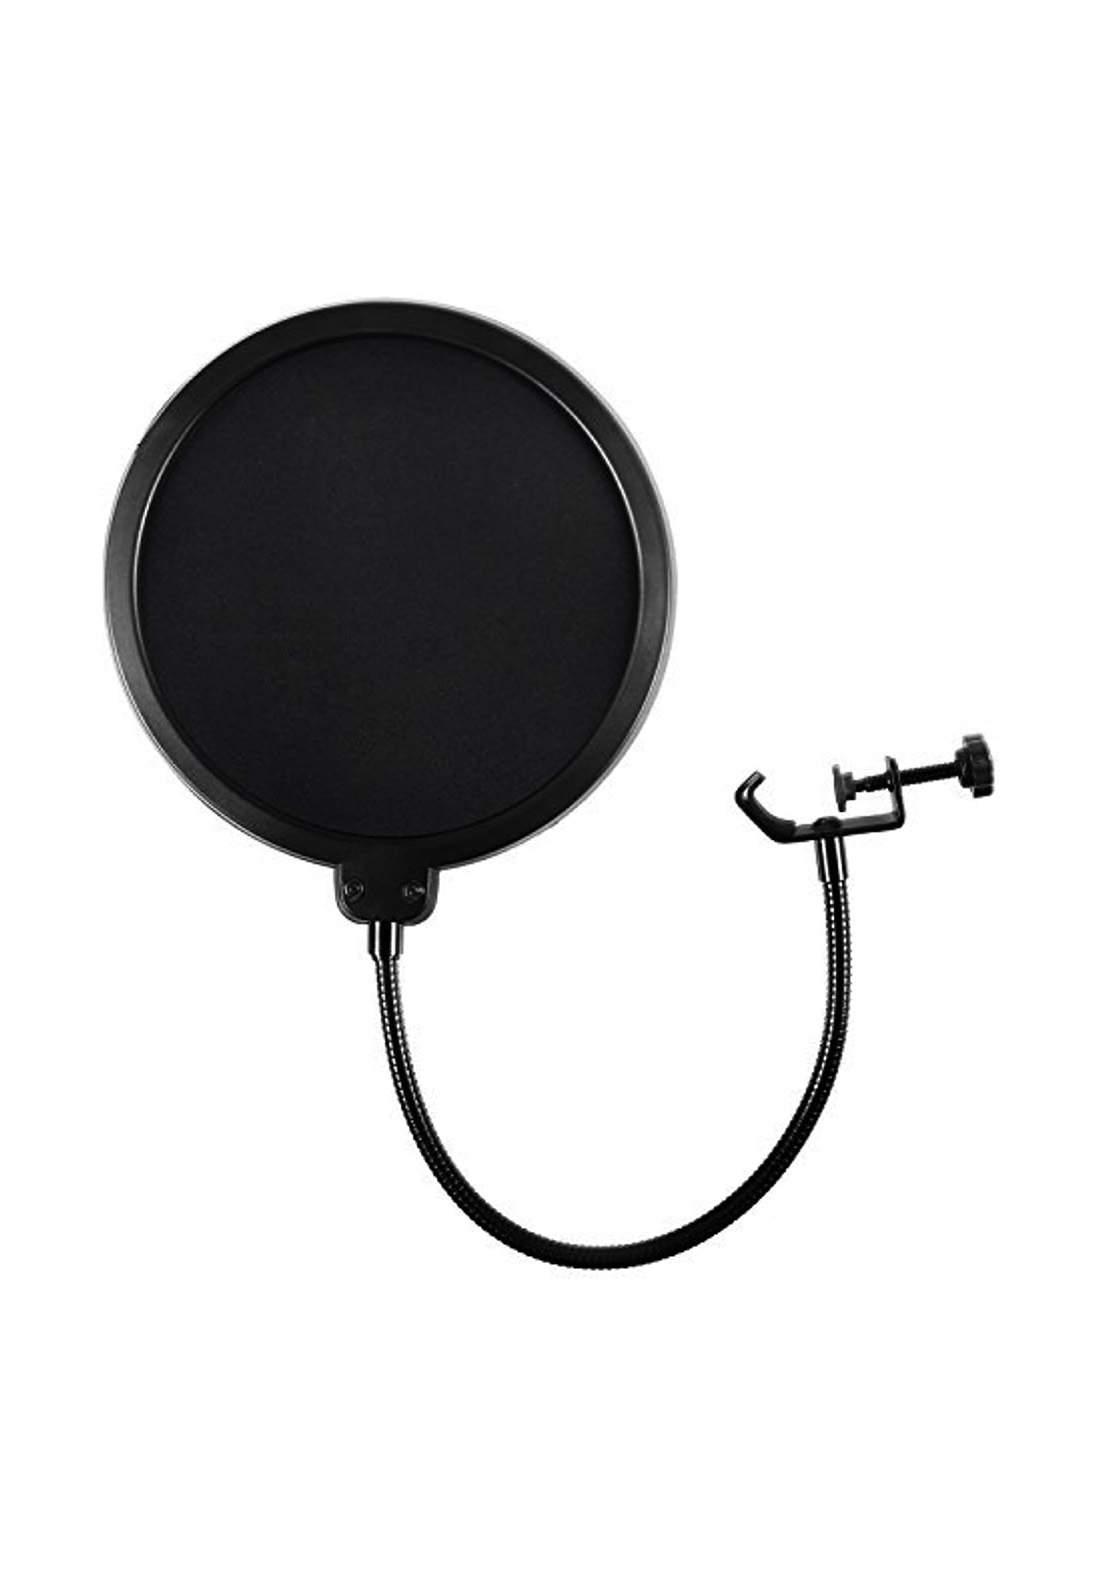 Studio microphone round shape with pop filter - Black فلتر مايكرفون